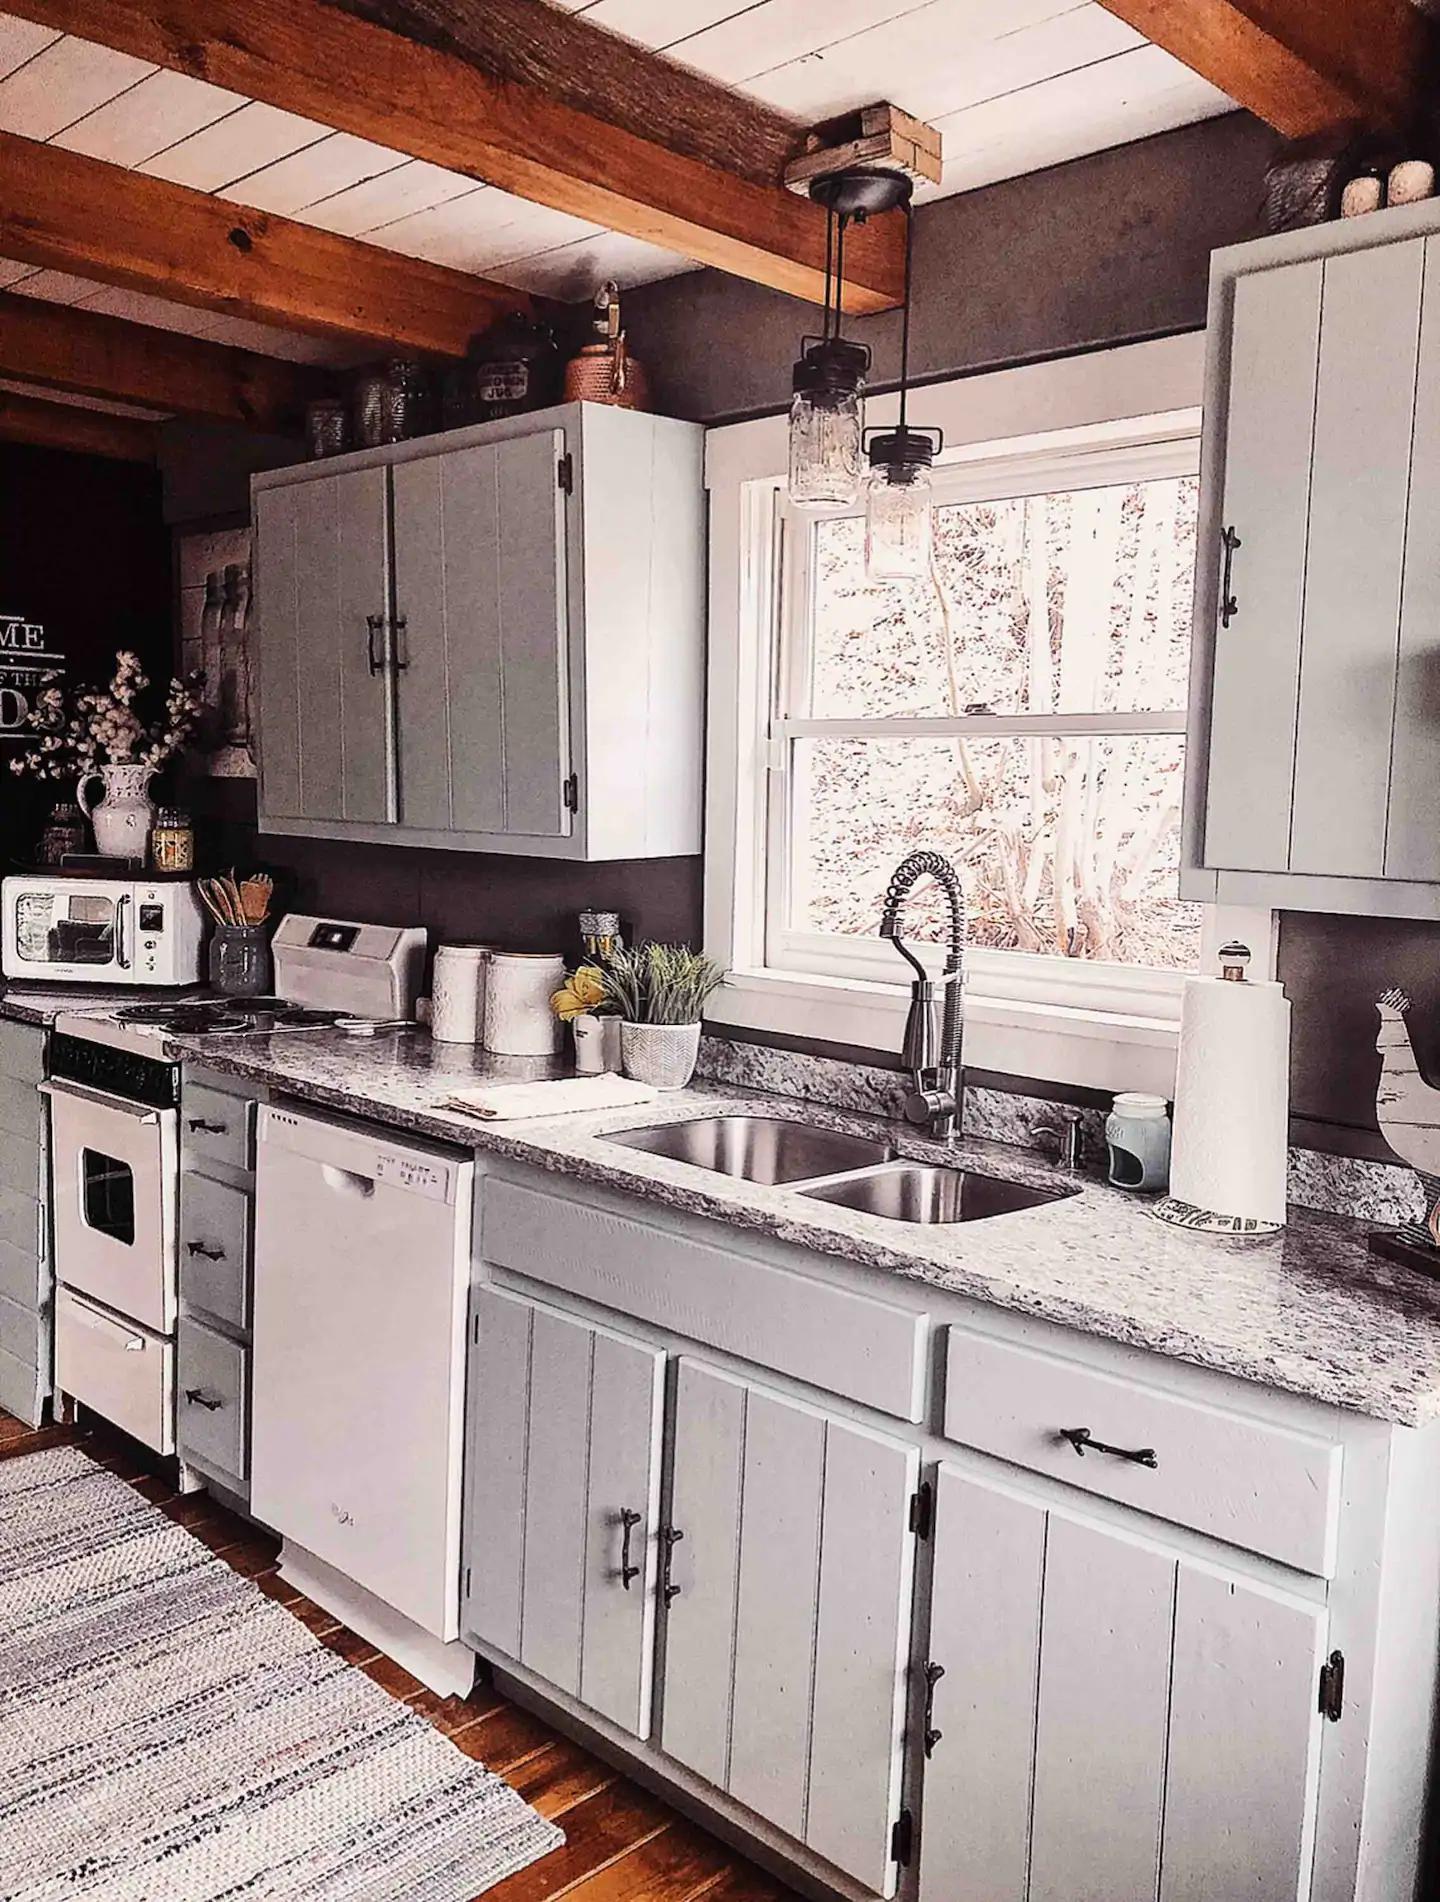 Tennessee Cider Company's Airbnb mason jar lodge kitchen